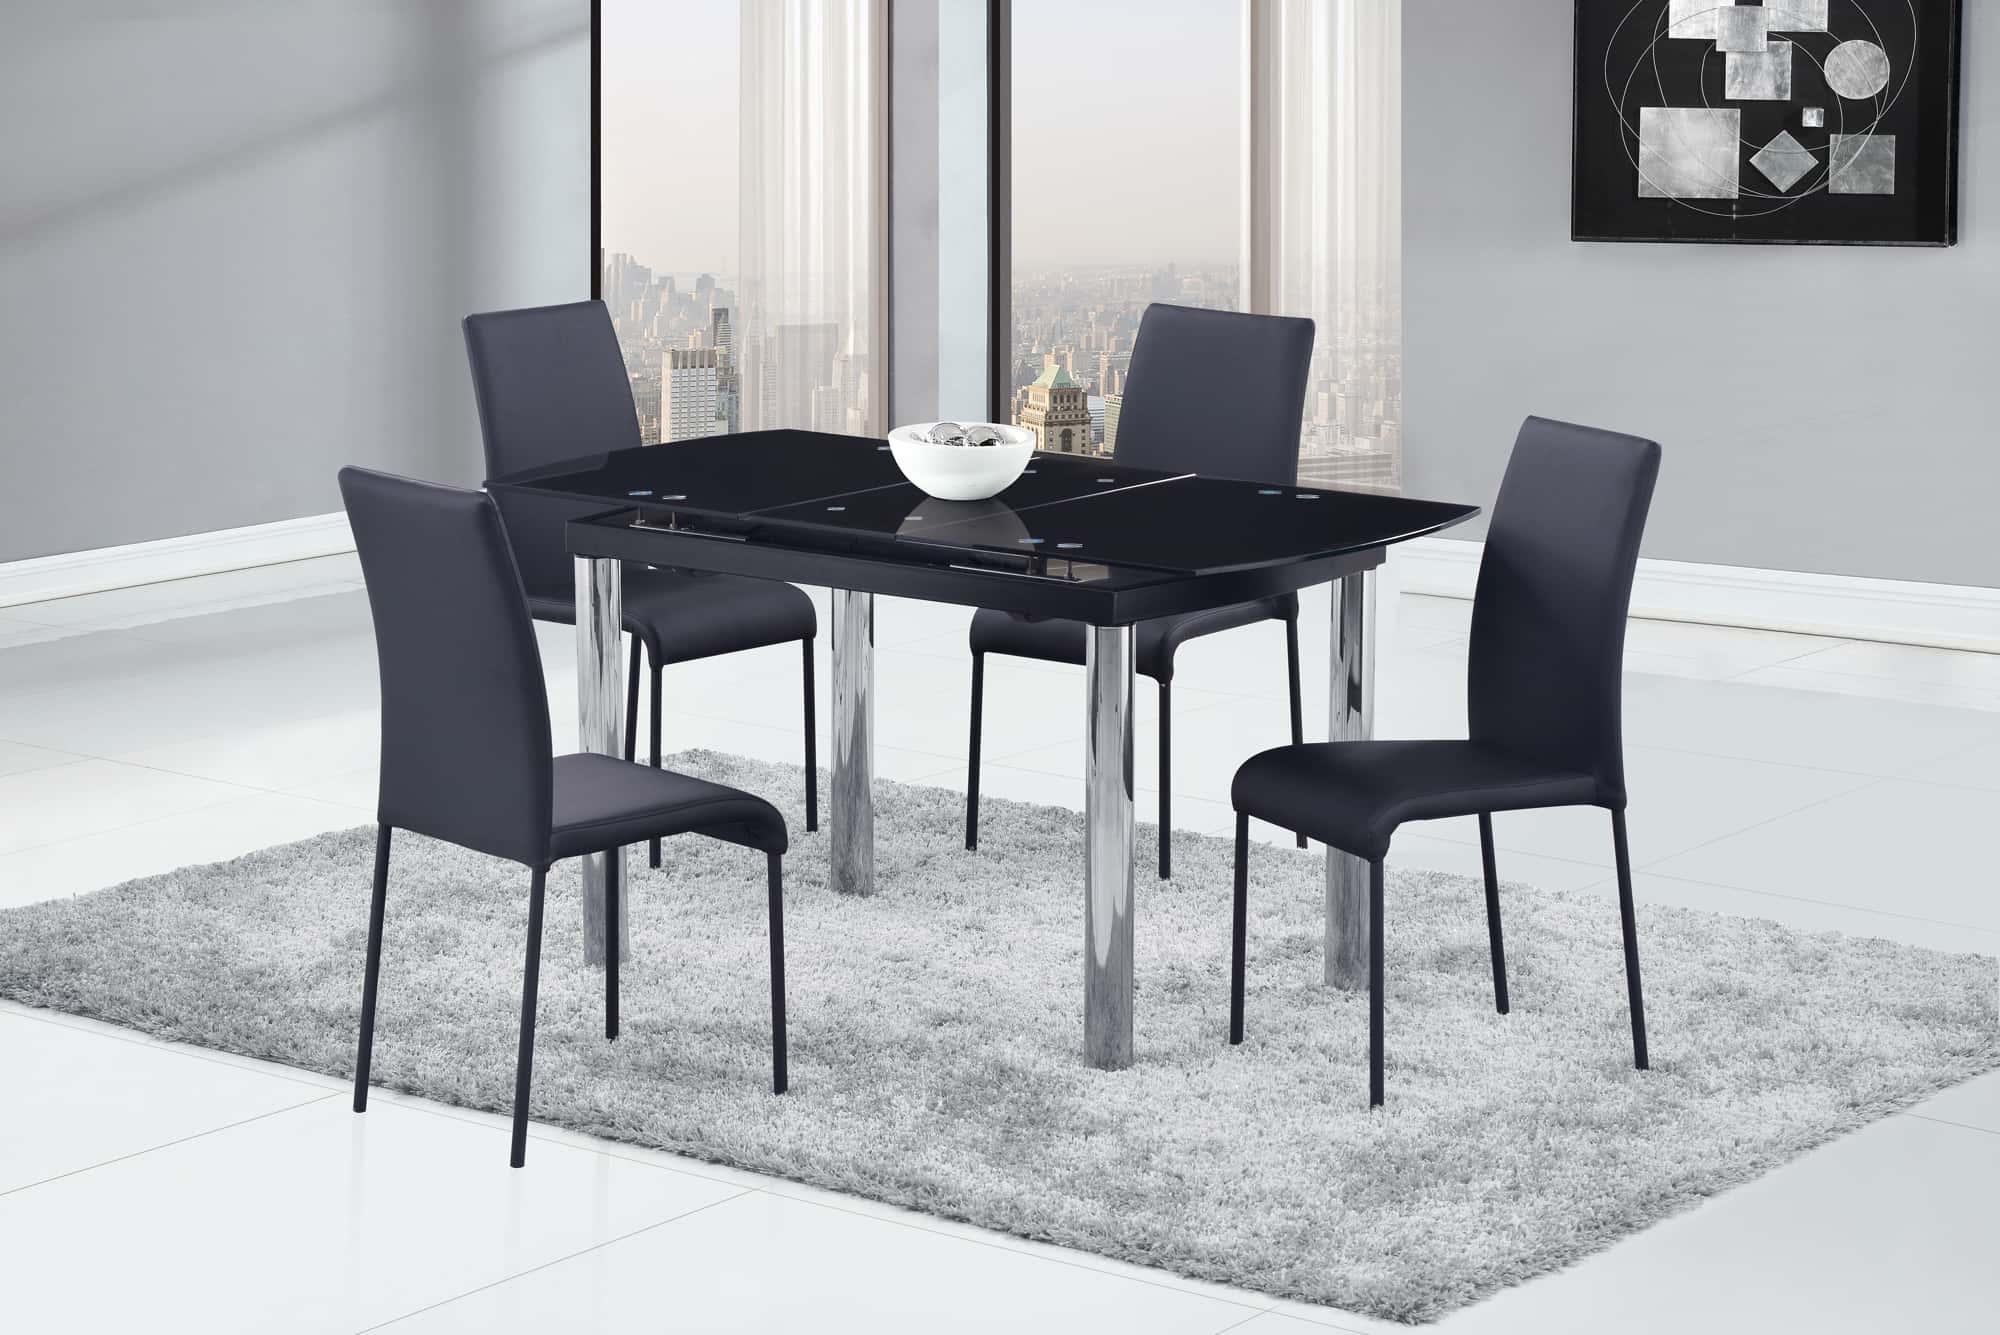 dining table d30dt chrome black glass top by global furniture. Black Bedroom Furniture Sets. Home Design Ideas